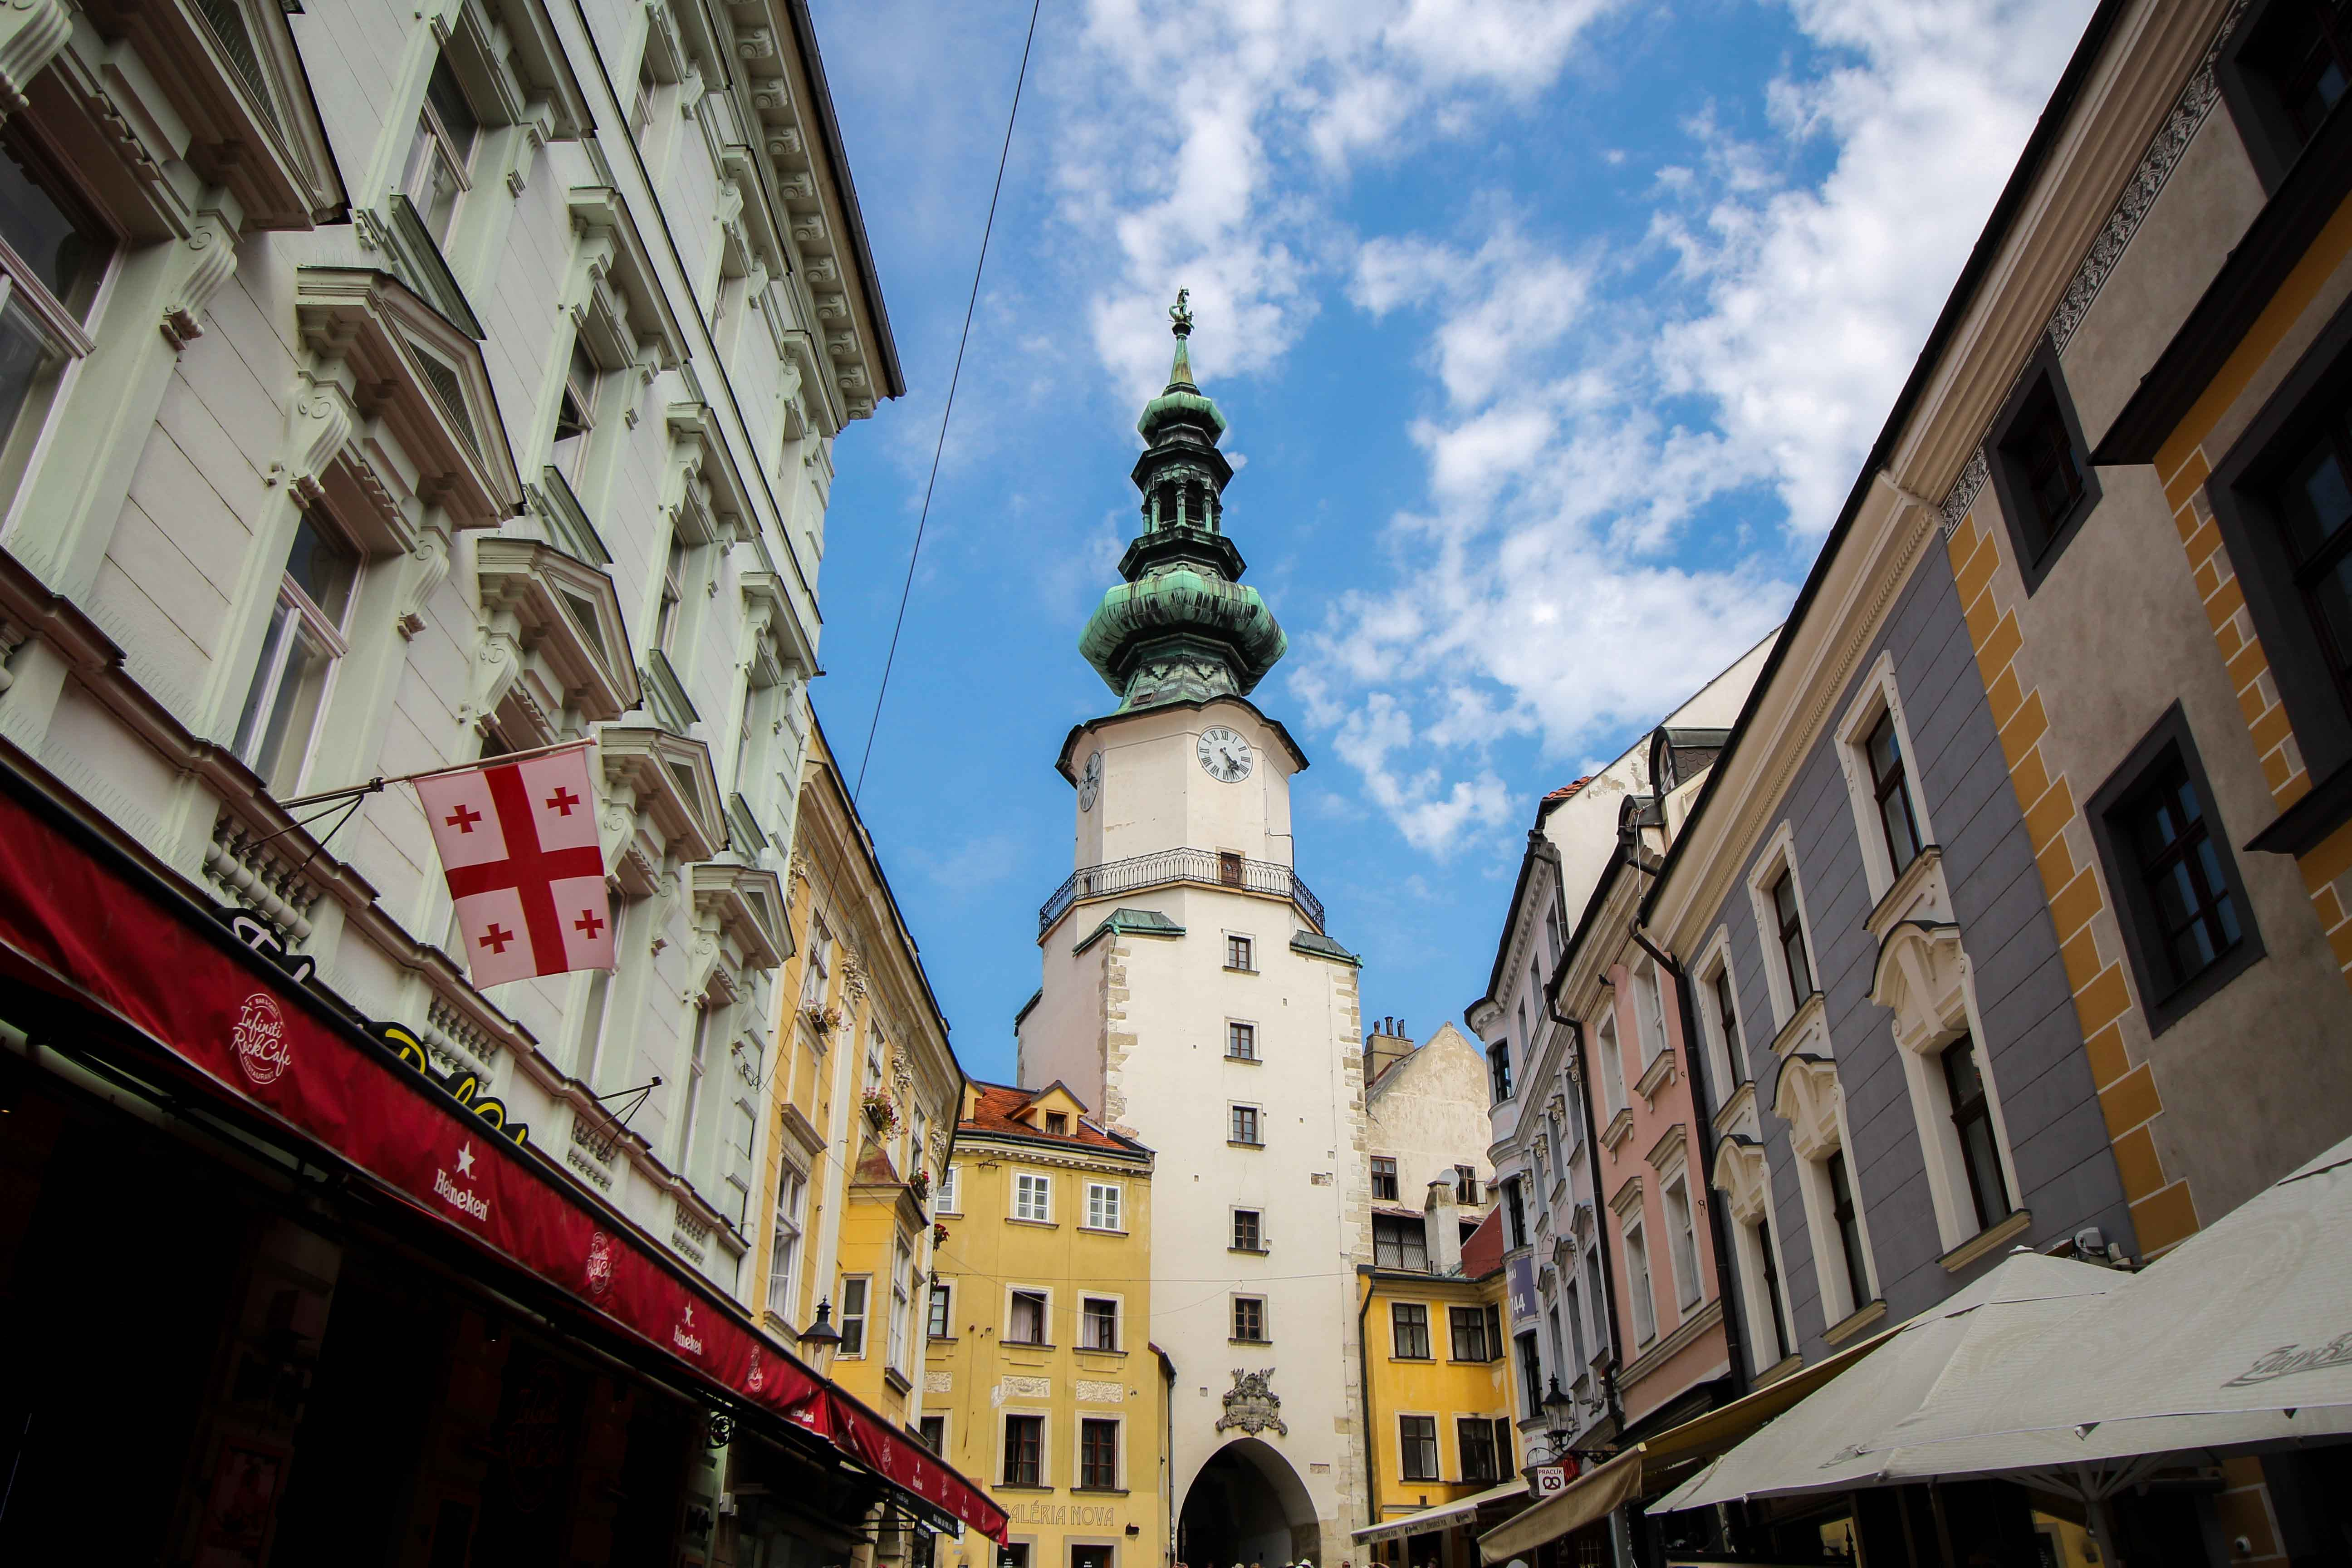 Bratislava Insider Tipps Sehenswürdigkeiten Bratislava Innenstadt Donaukreuzfahrt Arosa